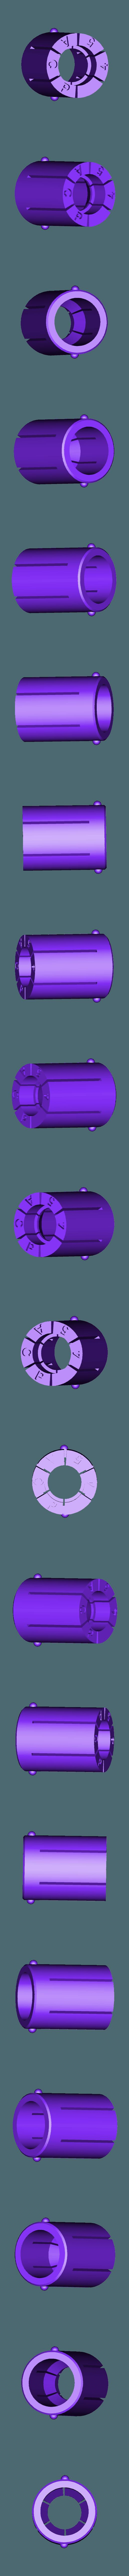 insert.45ACP.small.stl Download free STL file Bullet puller • 3D printable design, LionFox